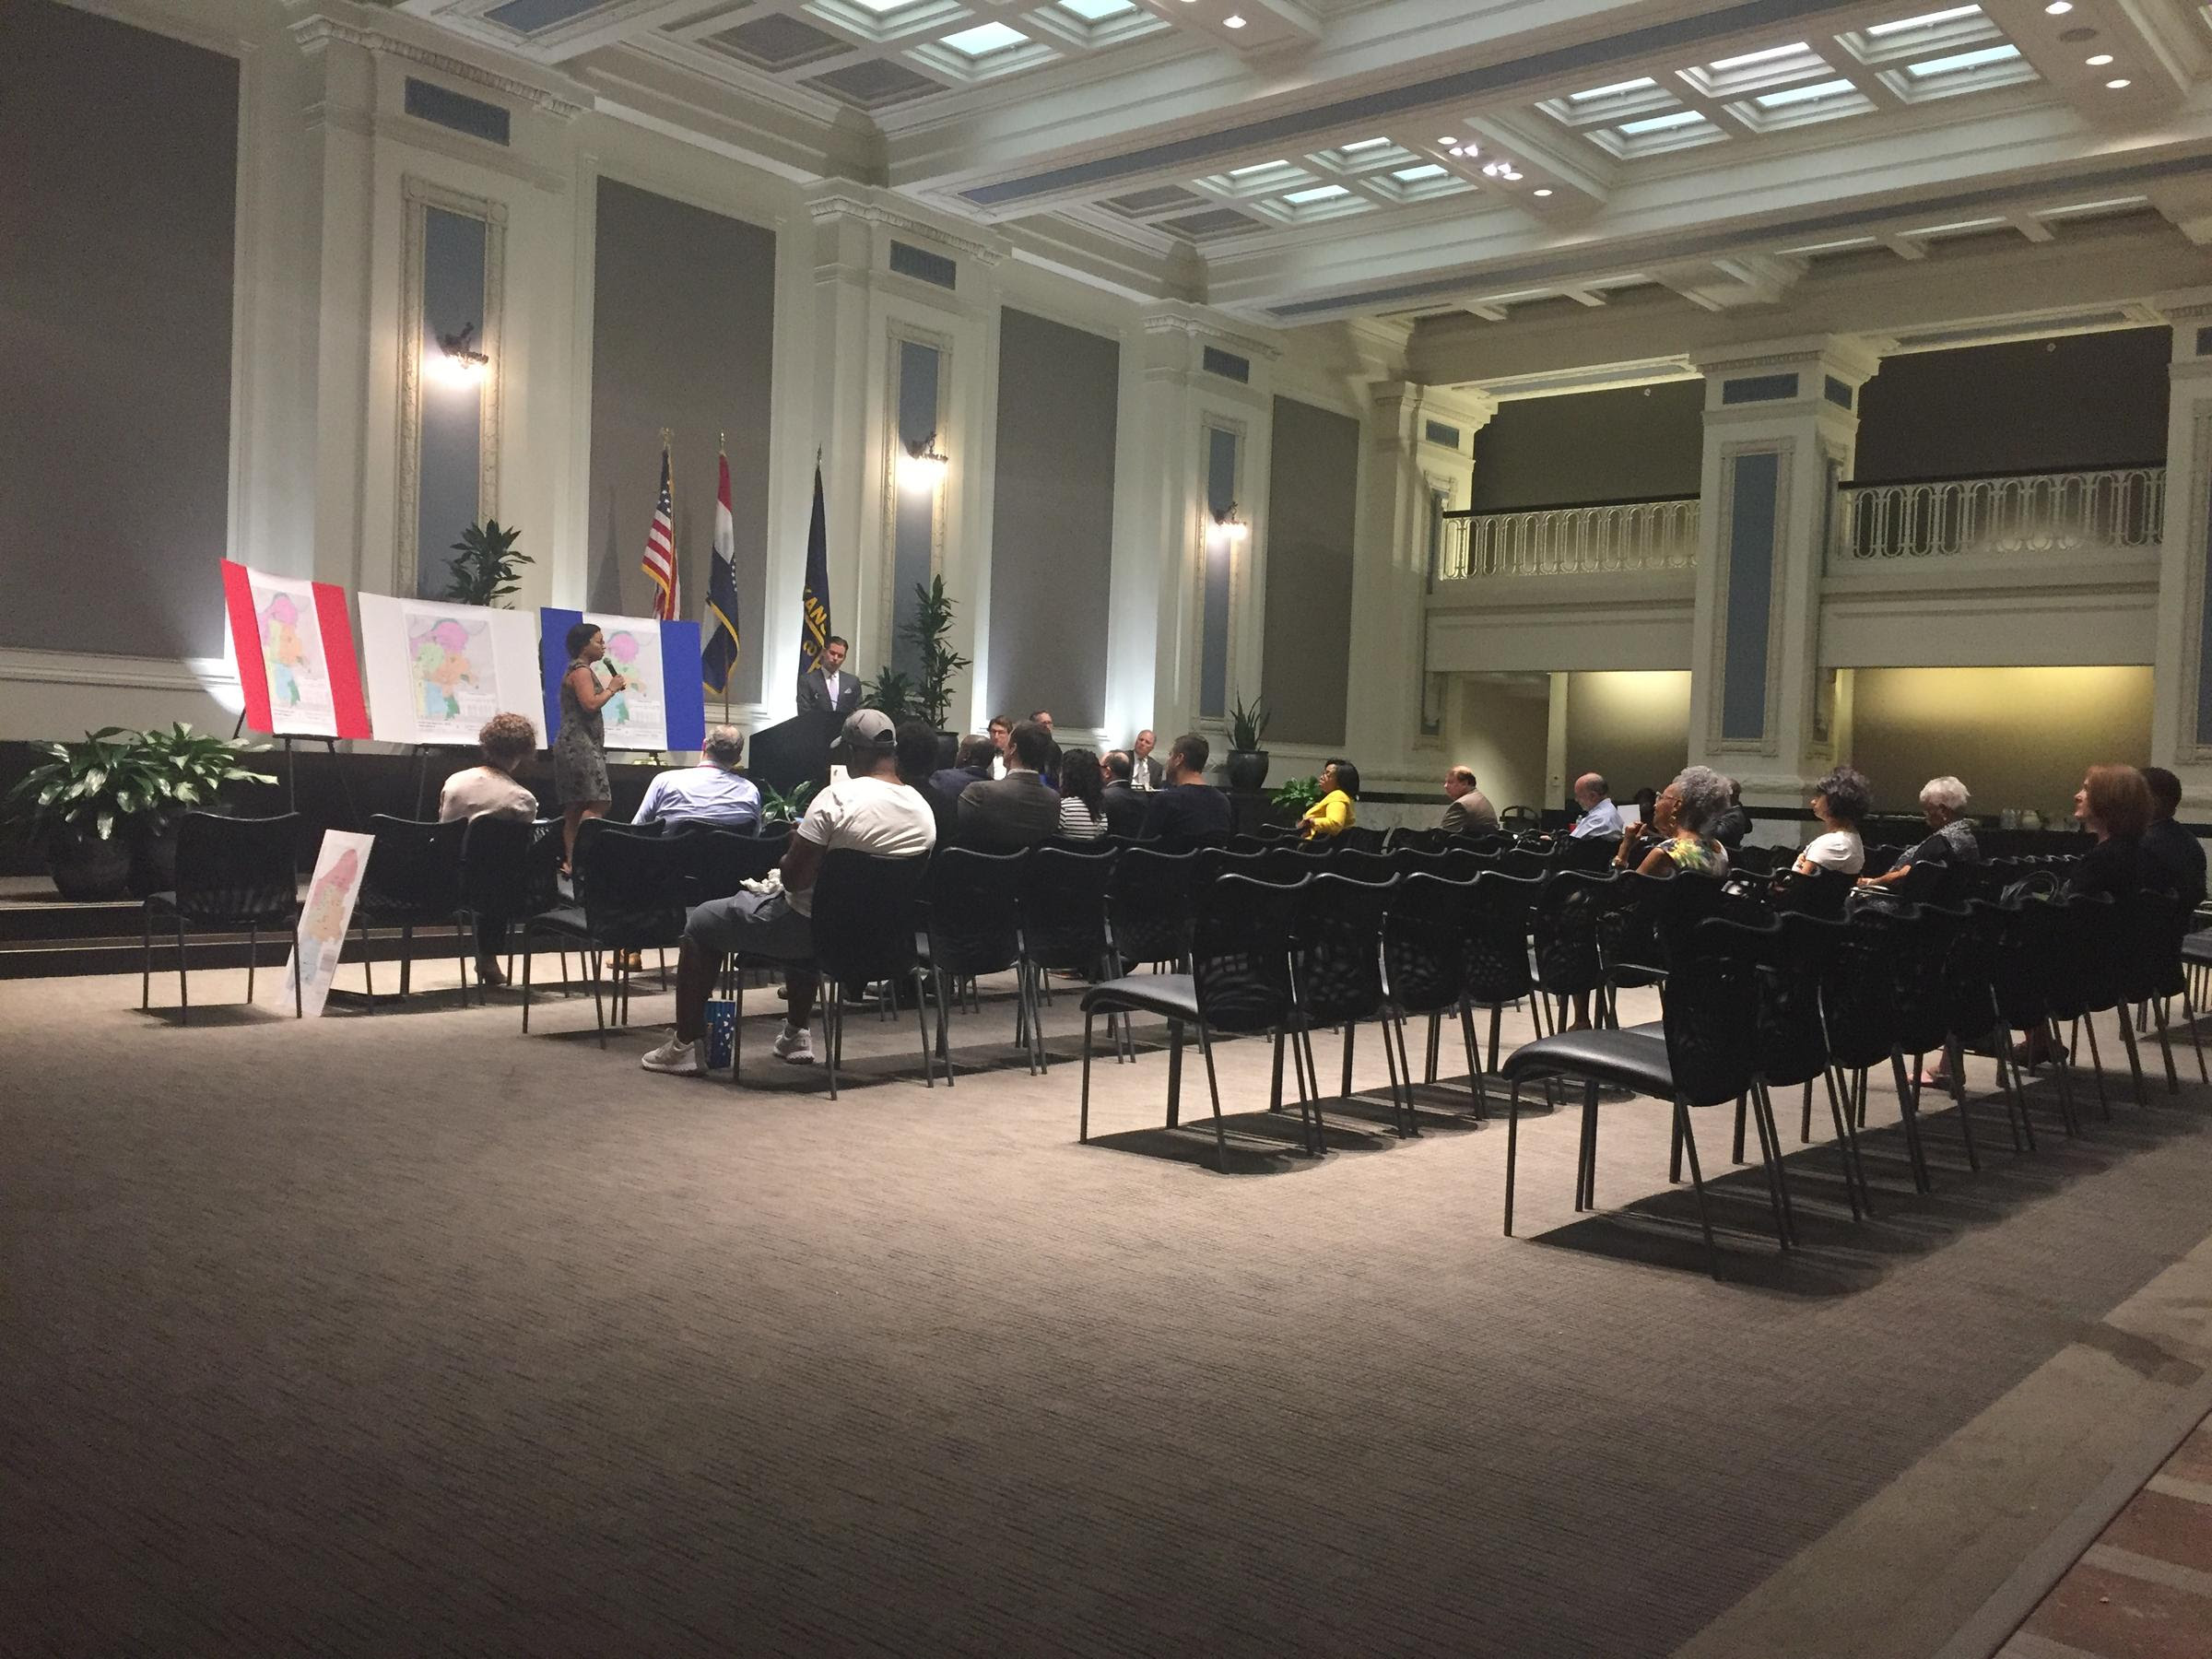 New Kansas City Public Schools Boundary Map Draws Criticism Kcur